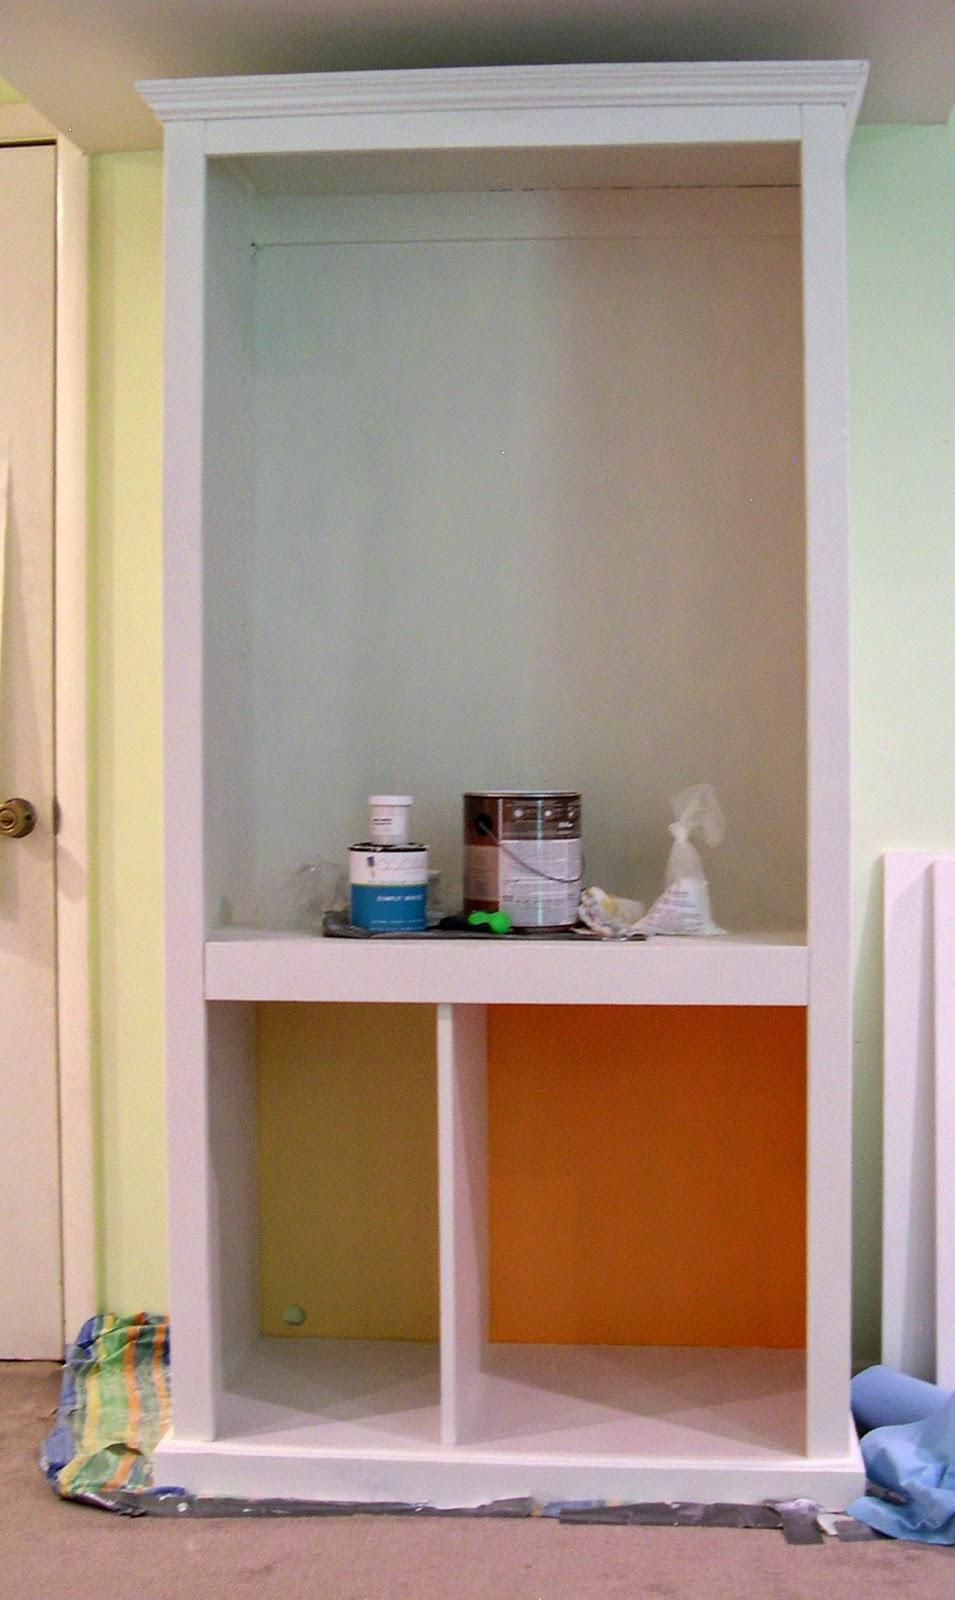 Impressive How To Install Cabinet Doors Decor